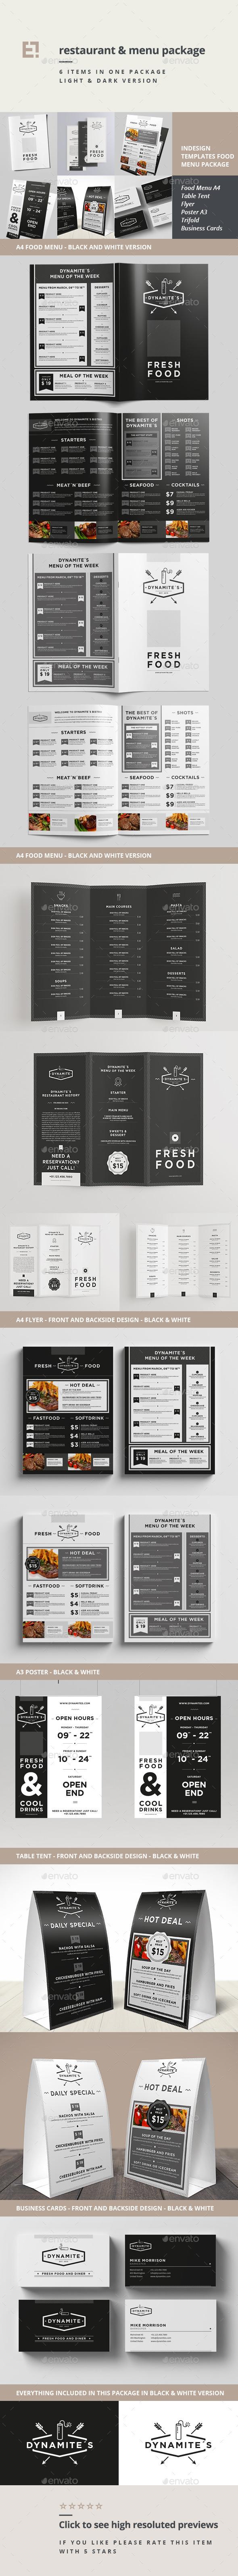 GraphicRiver Food Menu Bundle 11208131